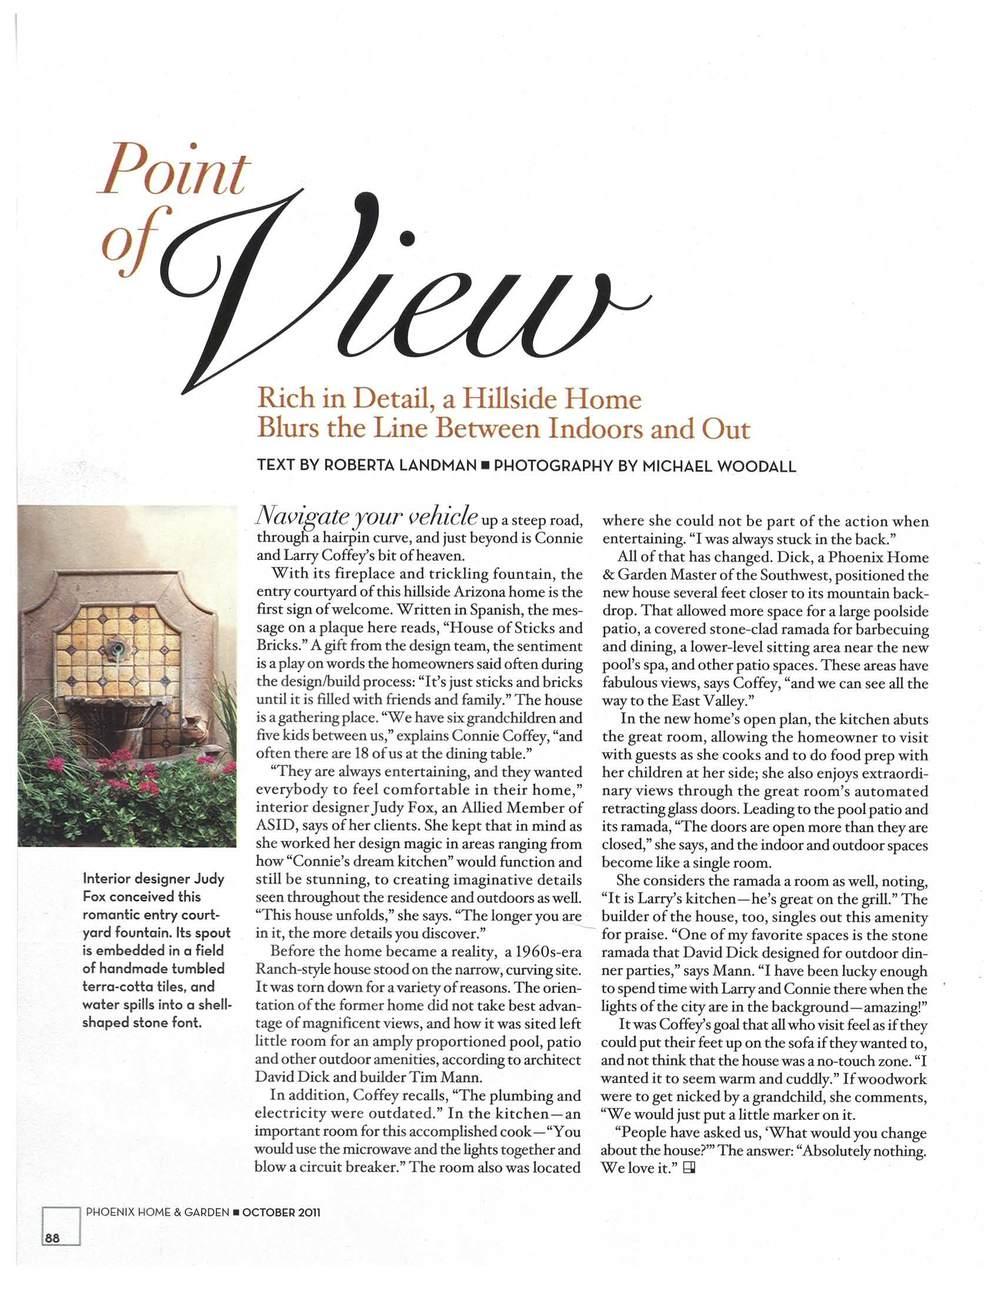 Page 88 Oct.jpg